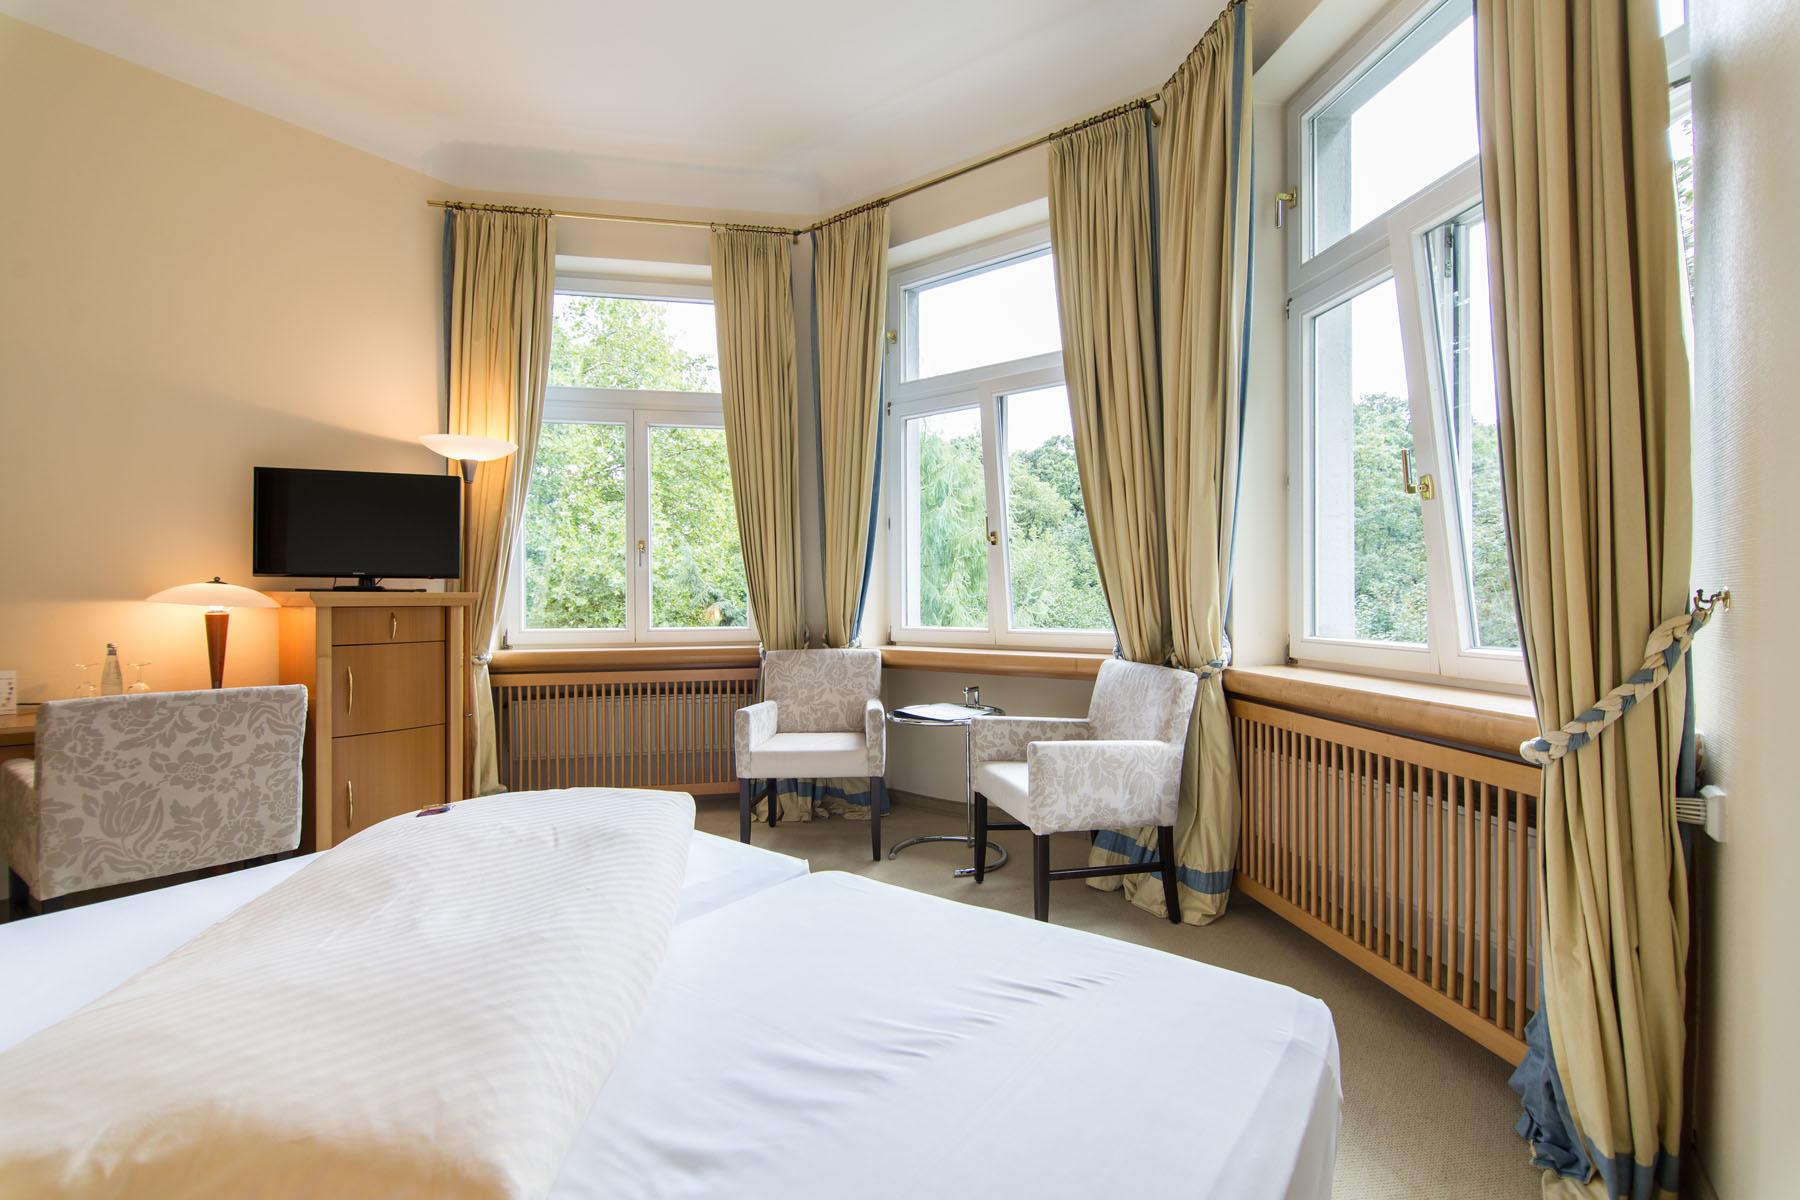 business doppelzimmer in essen waldhaus langenbrahm. Black Bedroom Furniture Sets. Home Design Ideas